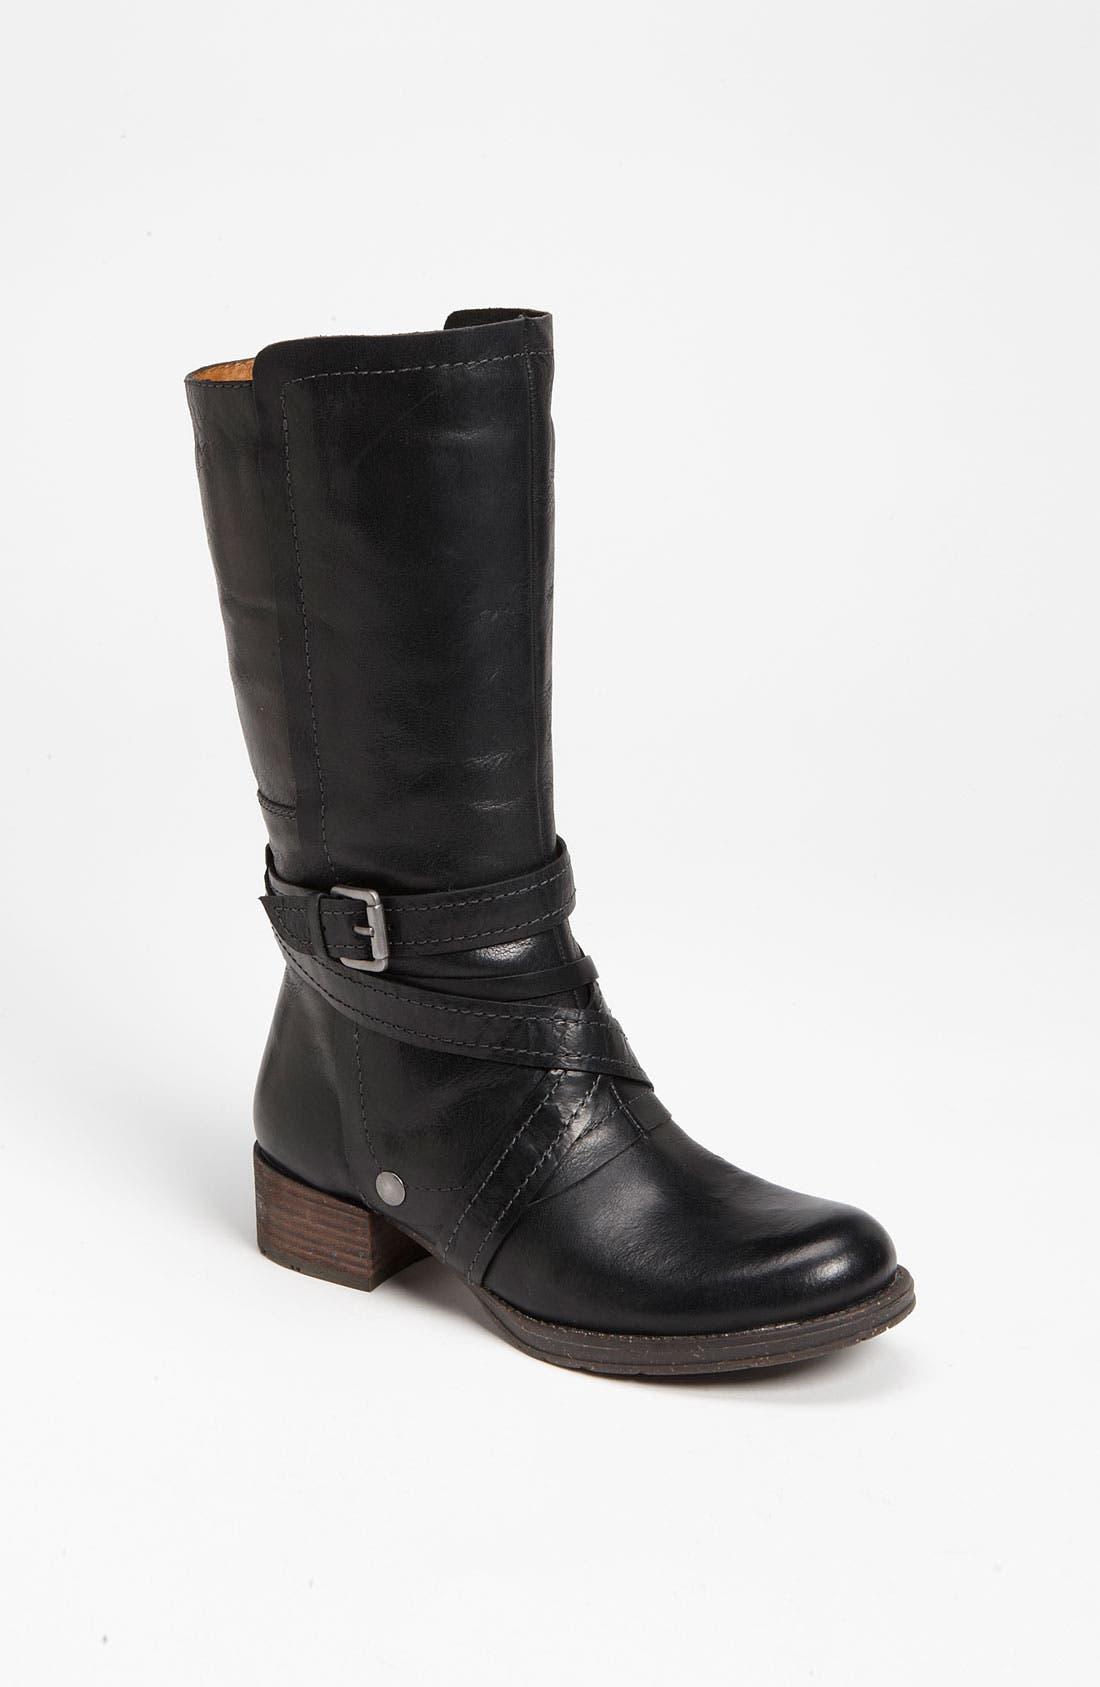 Alternate Image 1 Selected - Naya 'Sabre' Boot